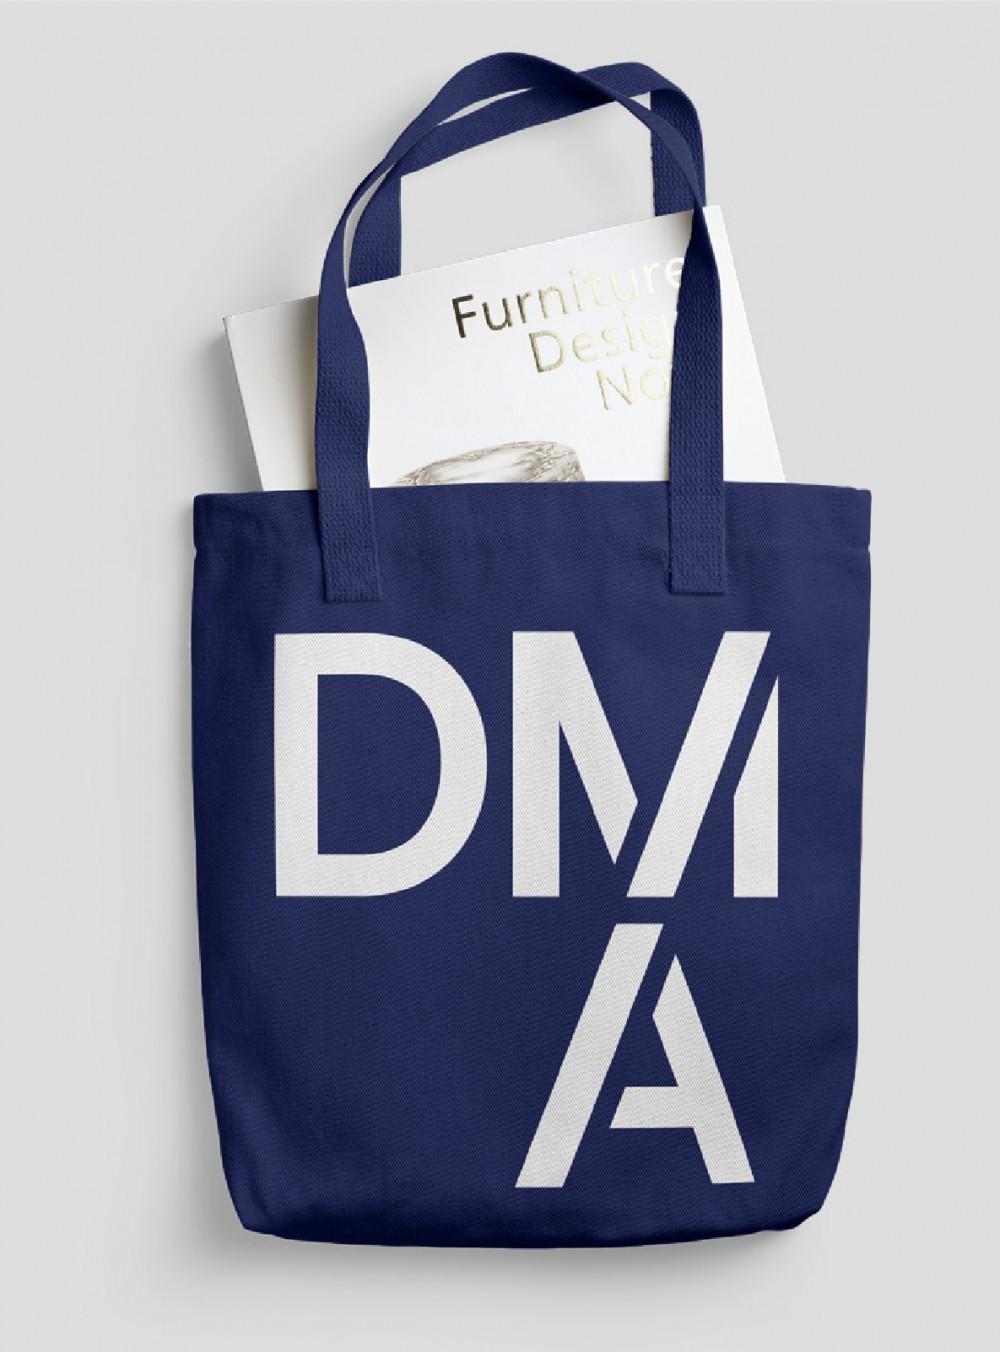 New  logo  and Identity for Data & Marketing Association by Jack Renwick Studio